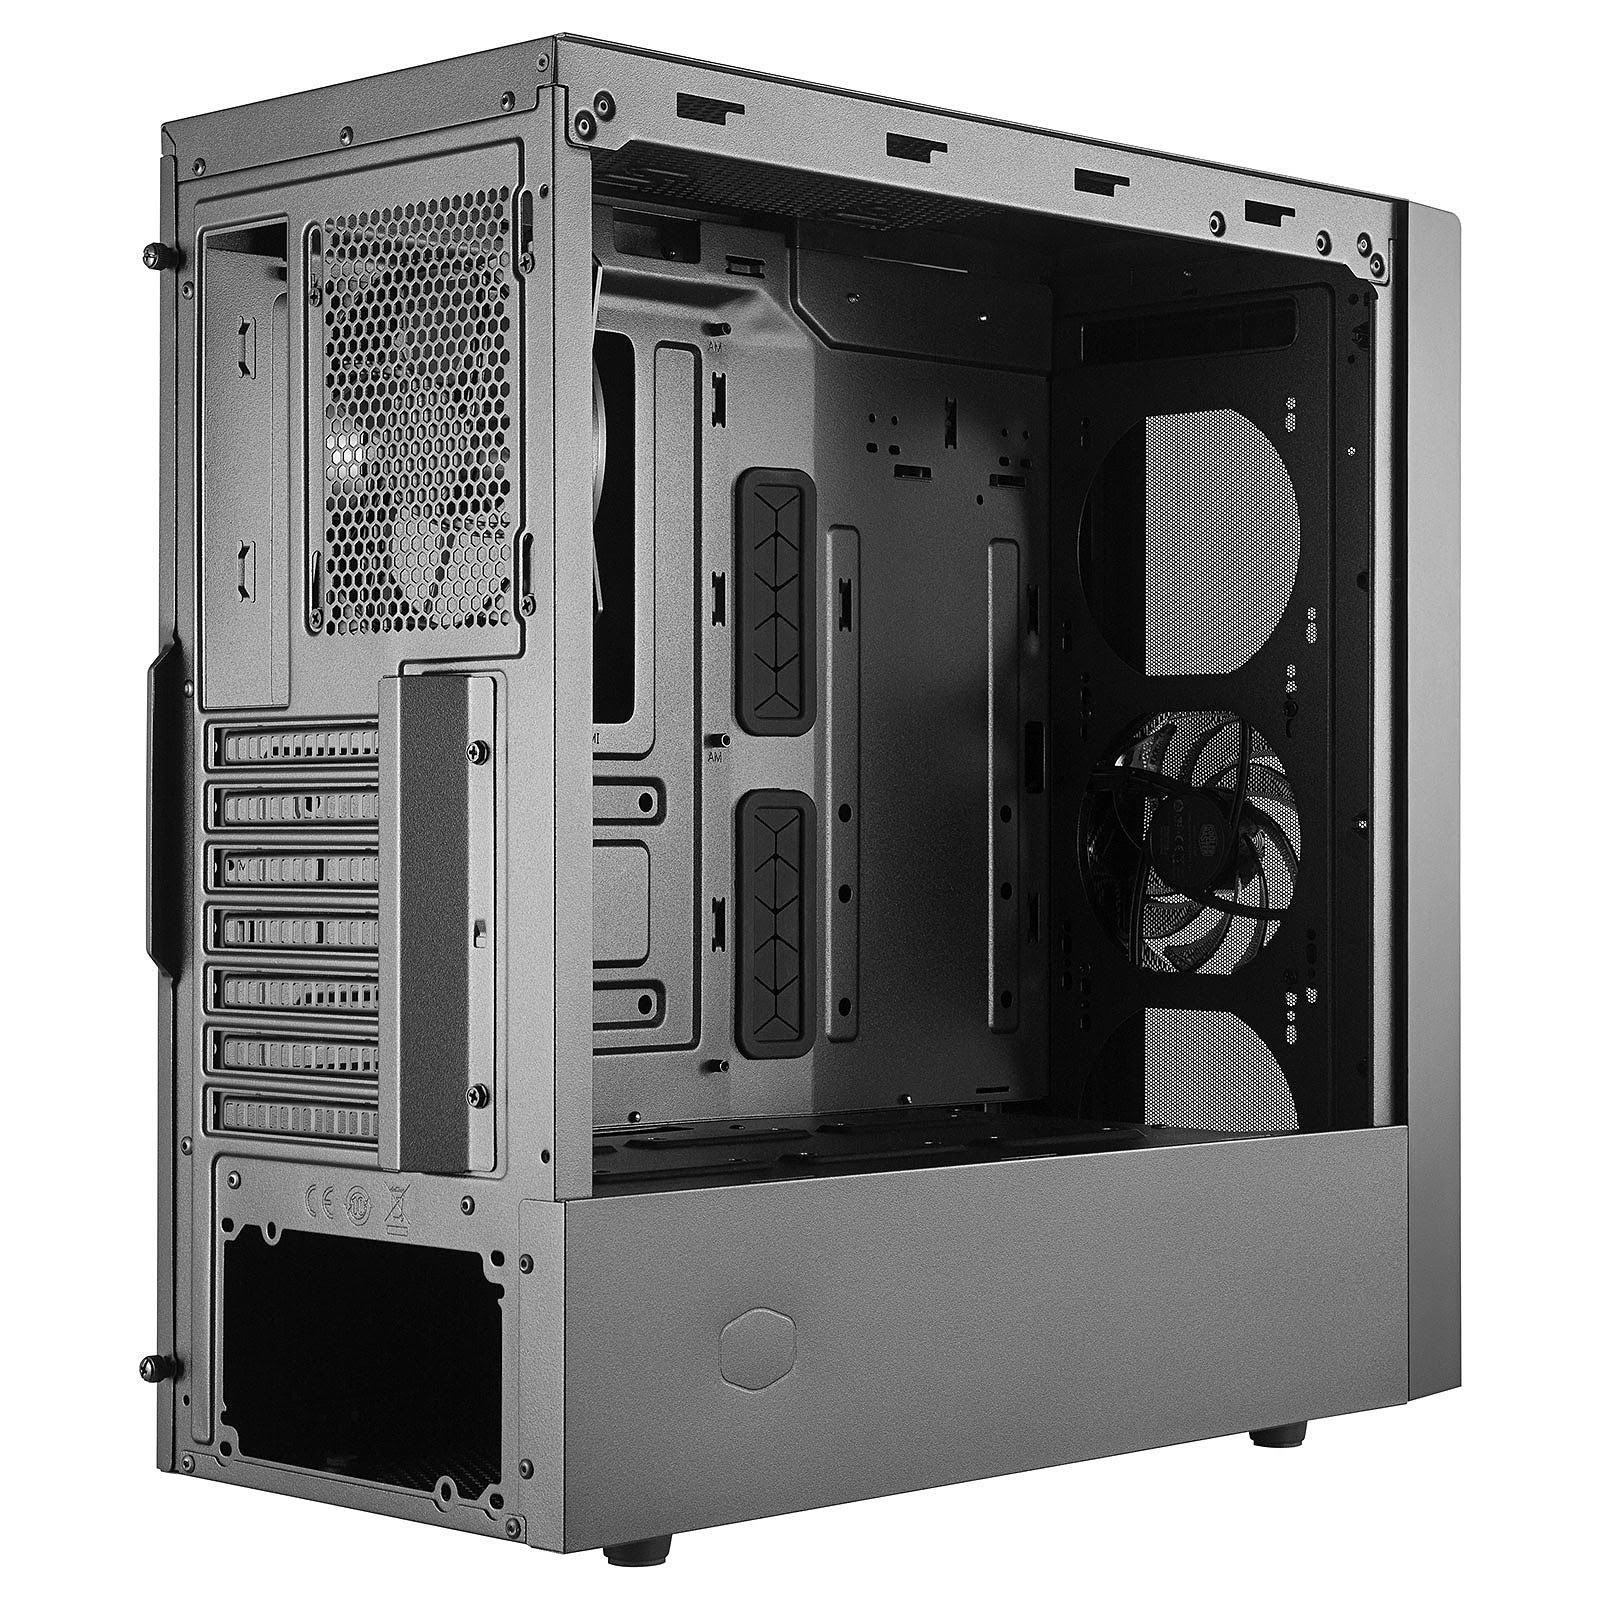 Cooler Master MasterBox NR600 MCB-NR600-KGNN-S00 Noir - Boîtier PC - 3